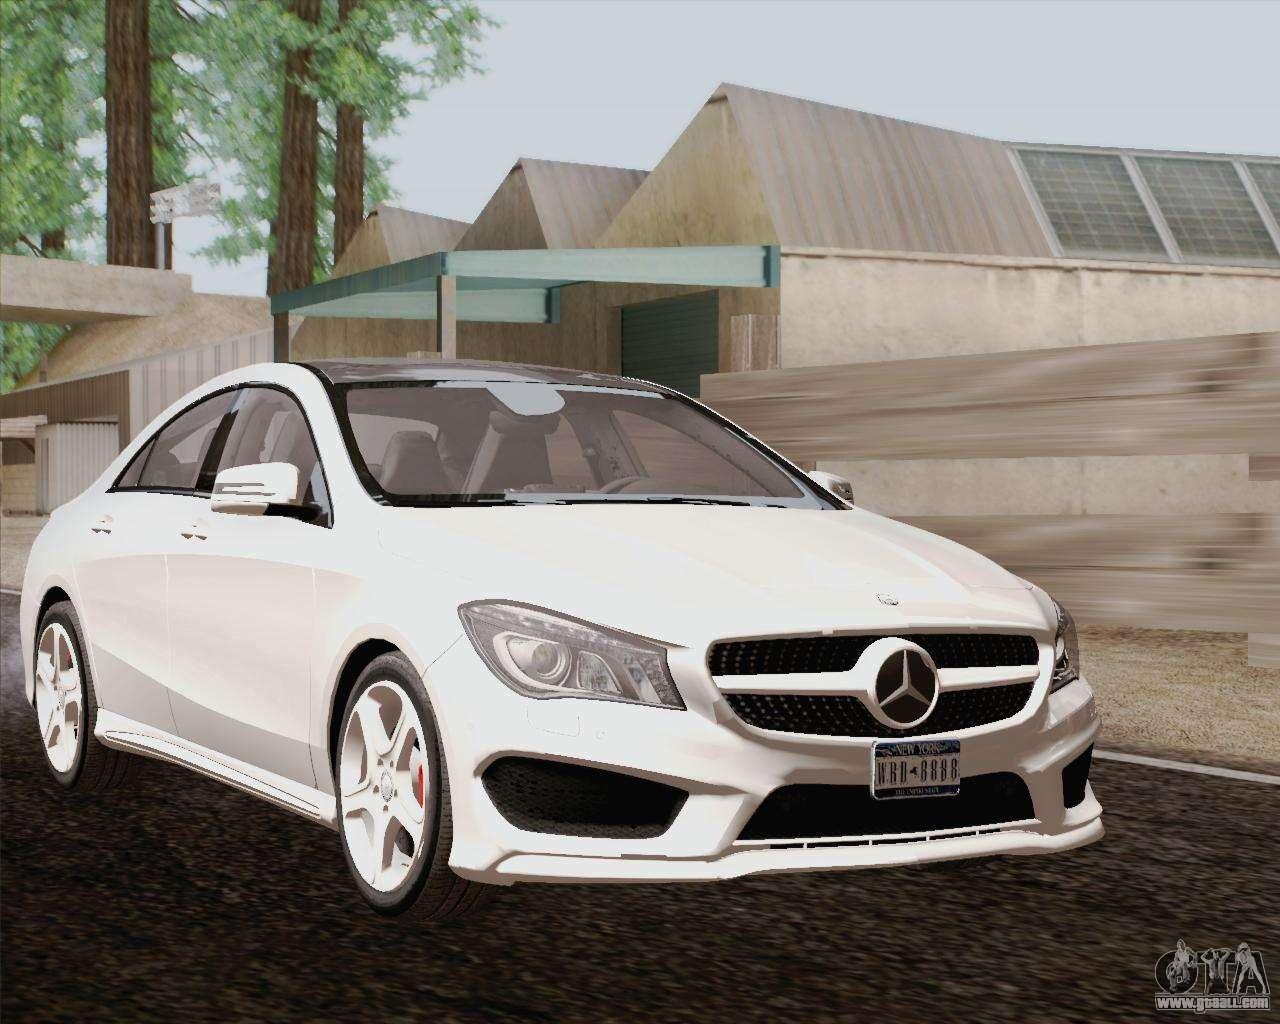 Mercedes benz cla 250 2013 for gta san andreas for 2013 cla mercedes benz